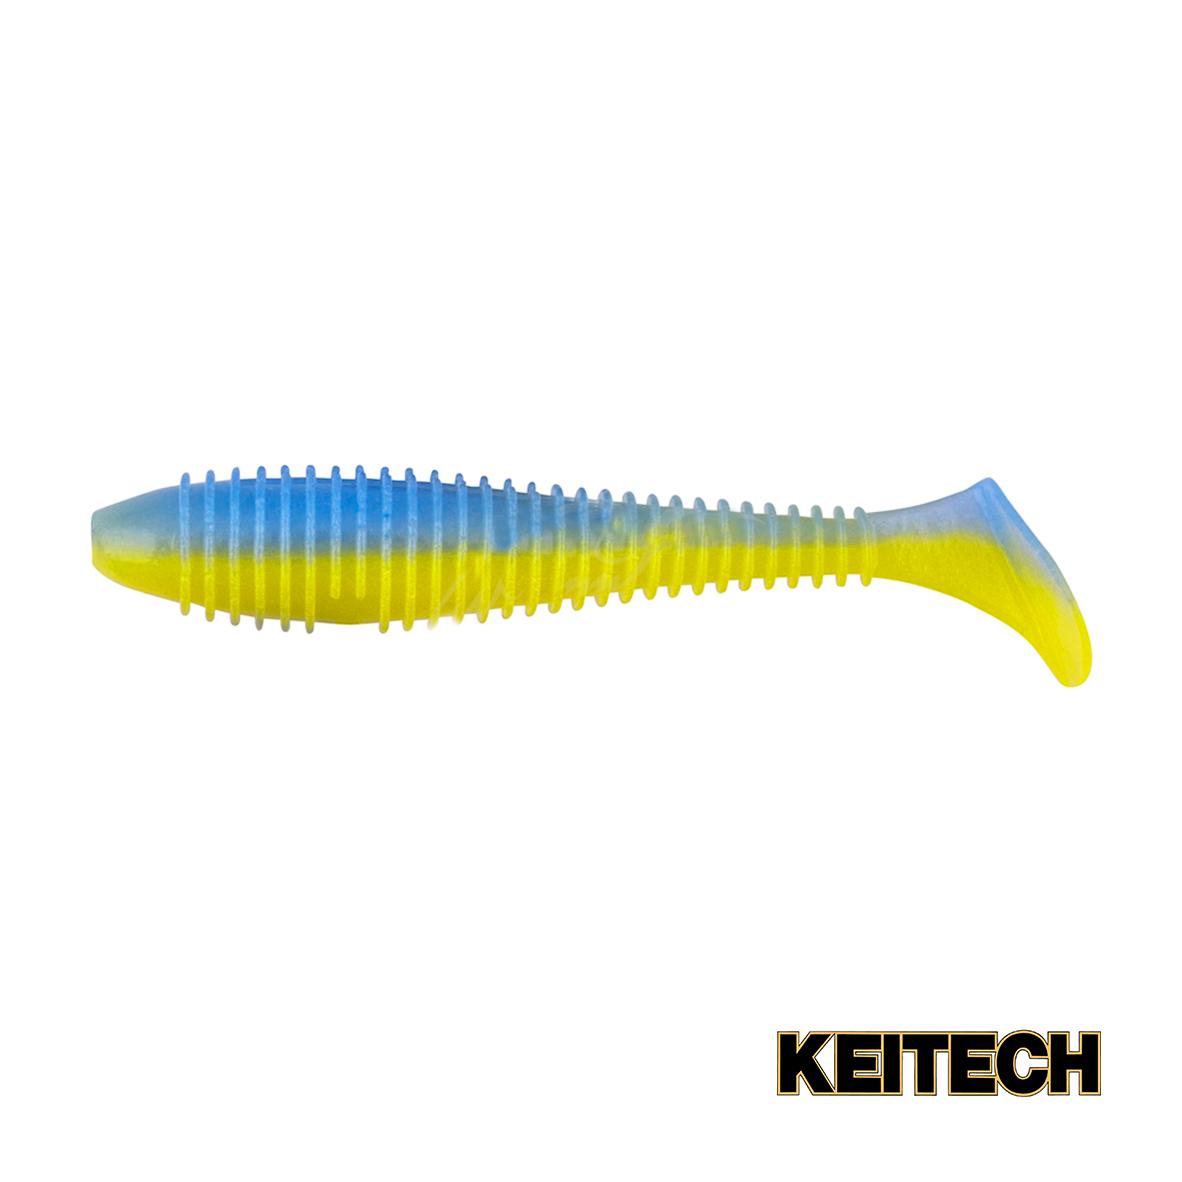 "Силикон Keitech Swing Impact FAT 3.3"" (7 шт/упак) ц:ea#12 ua limi"